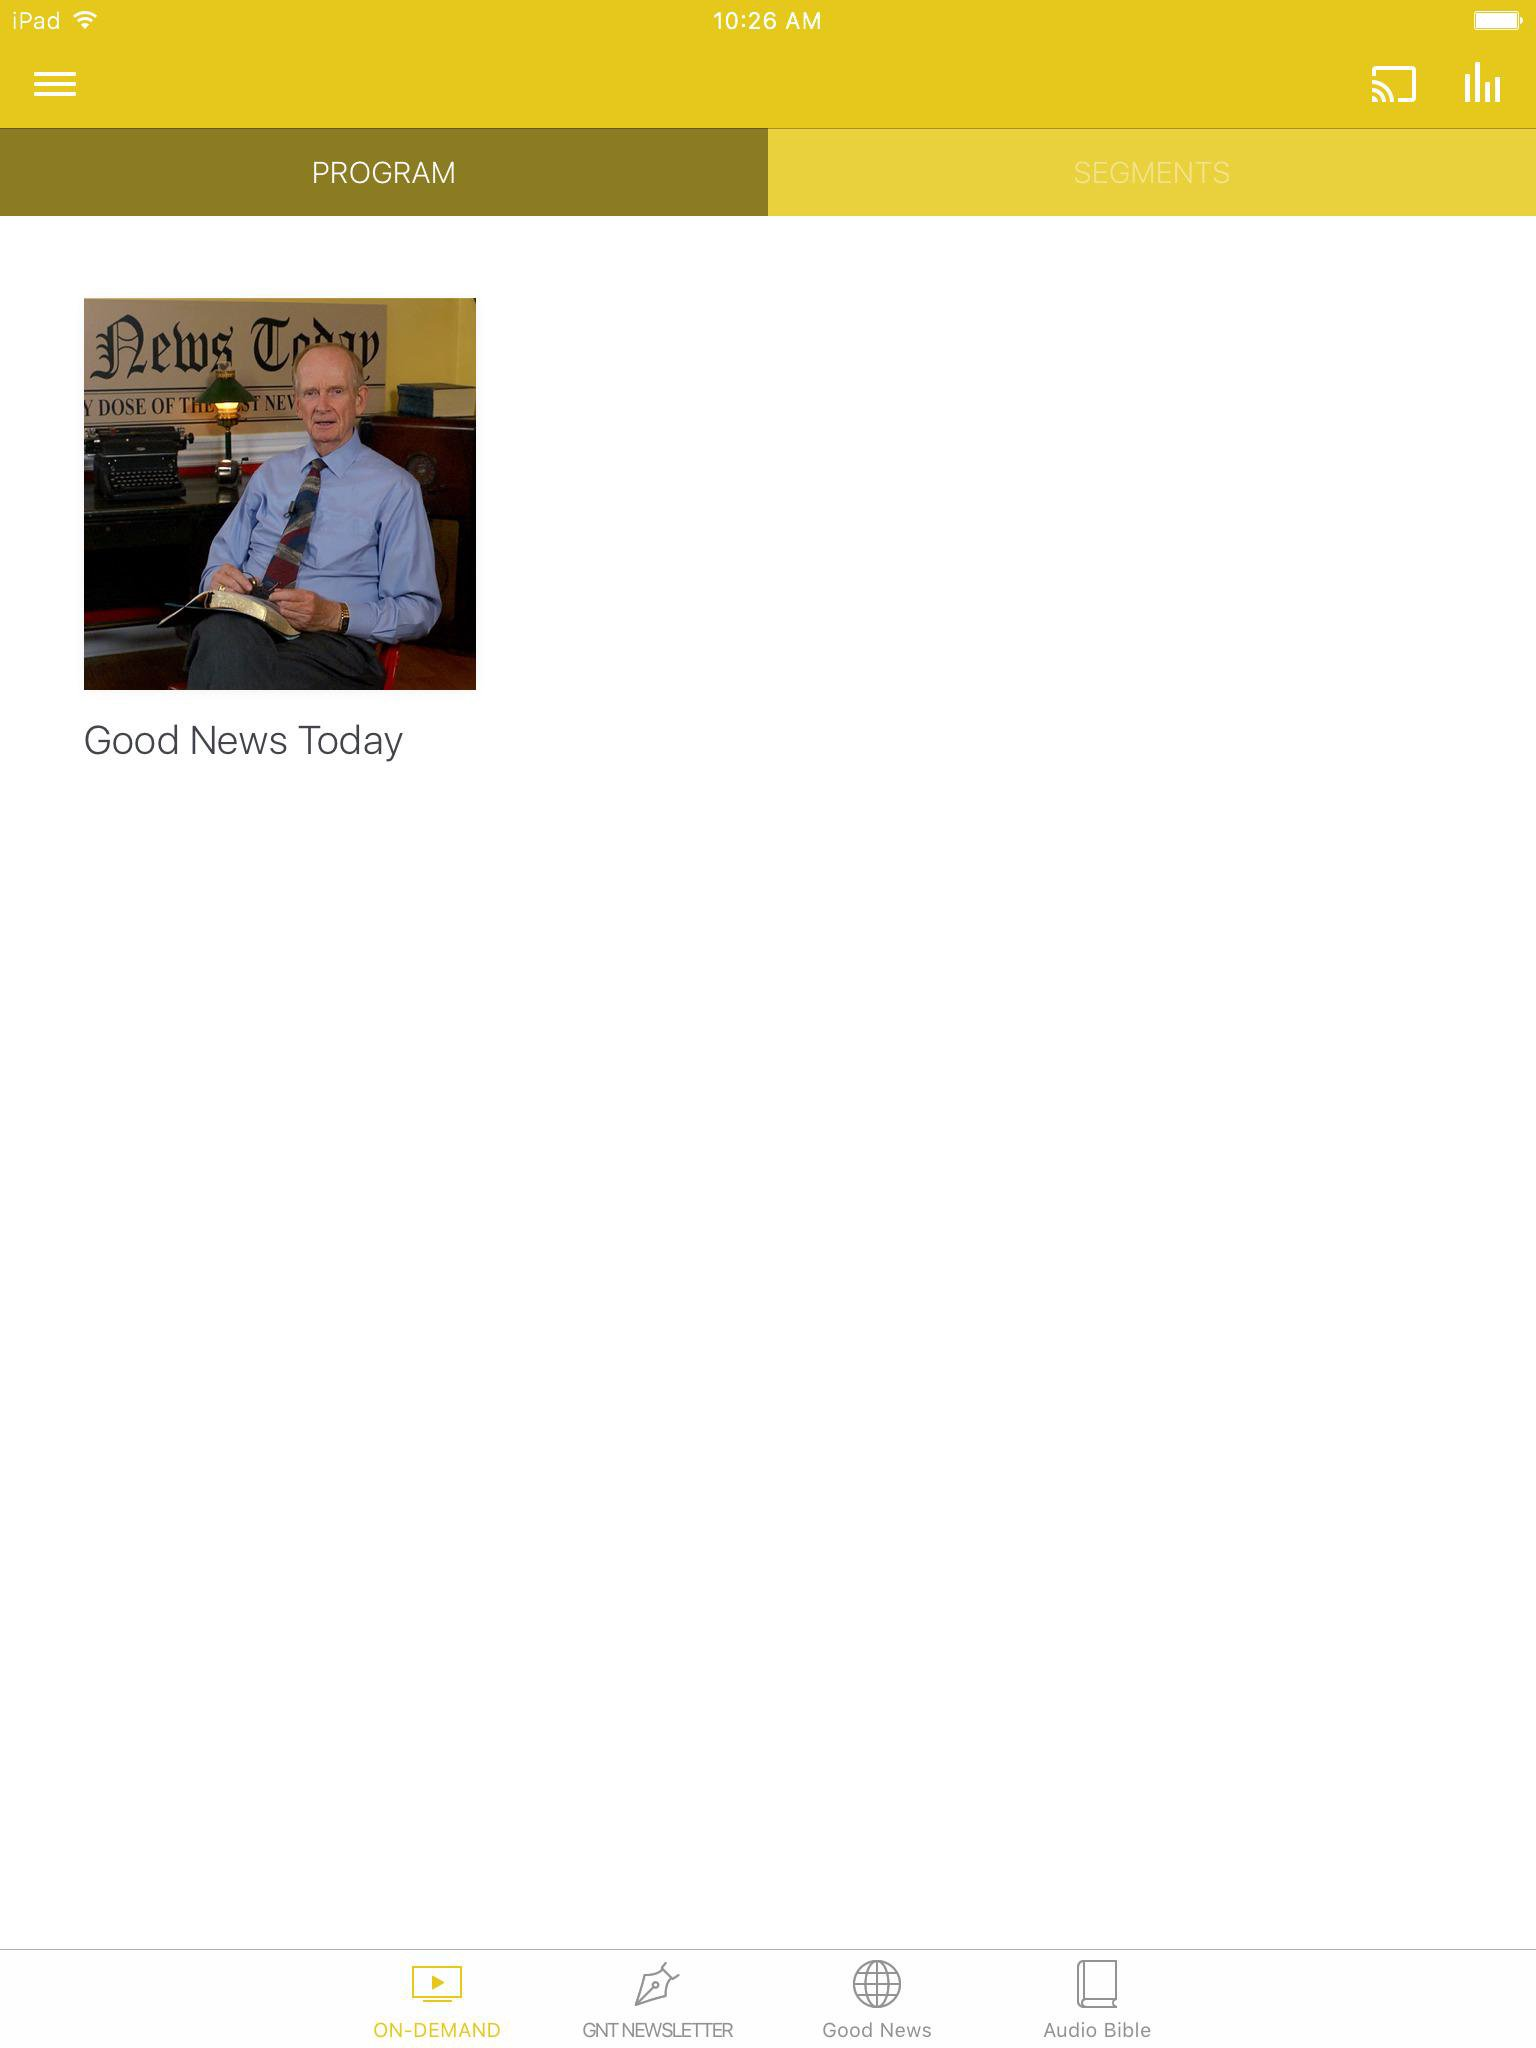 App - Good News Today